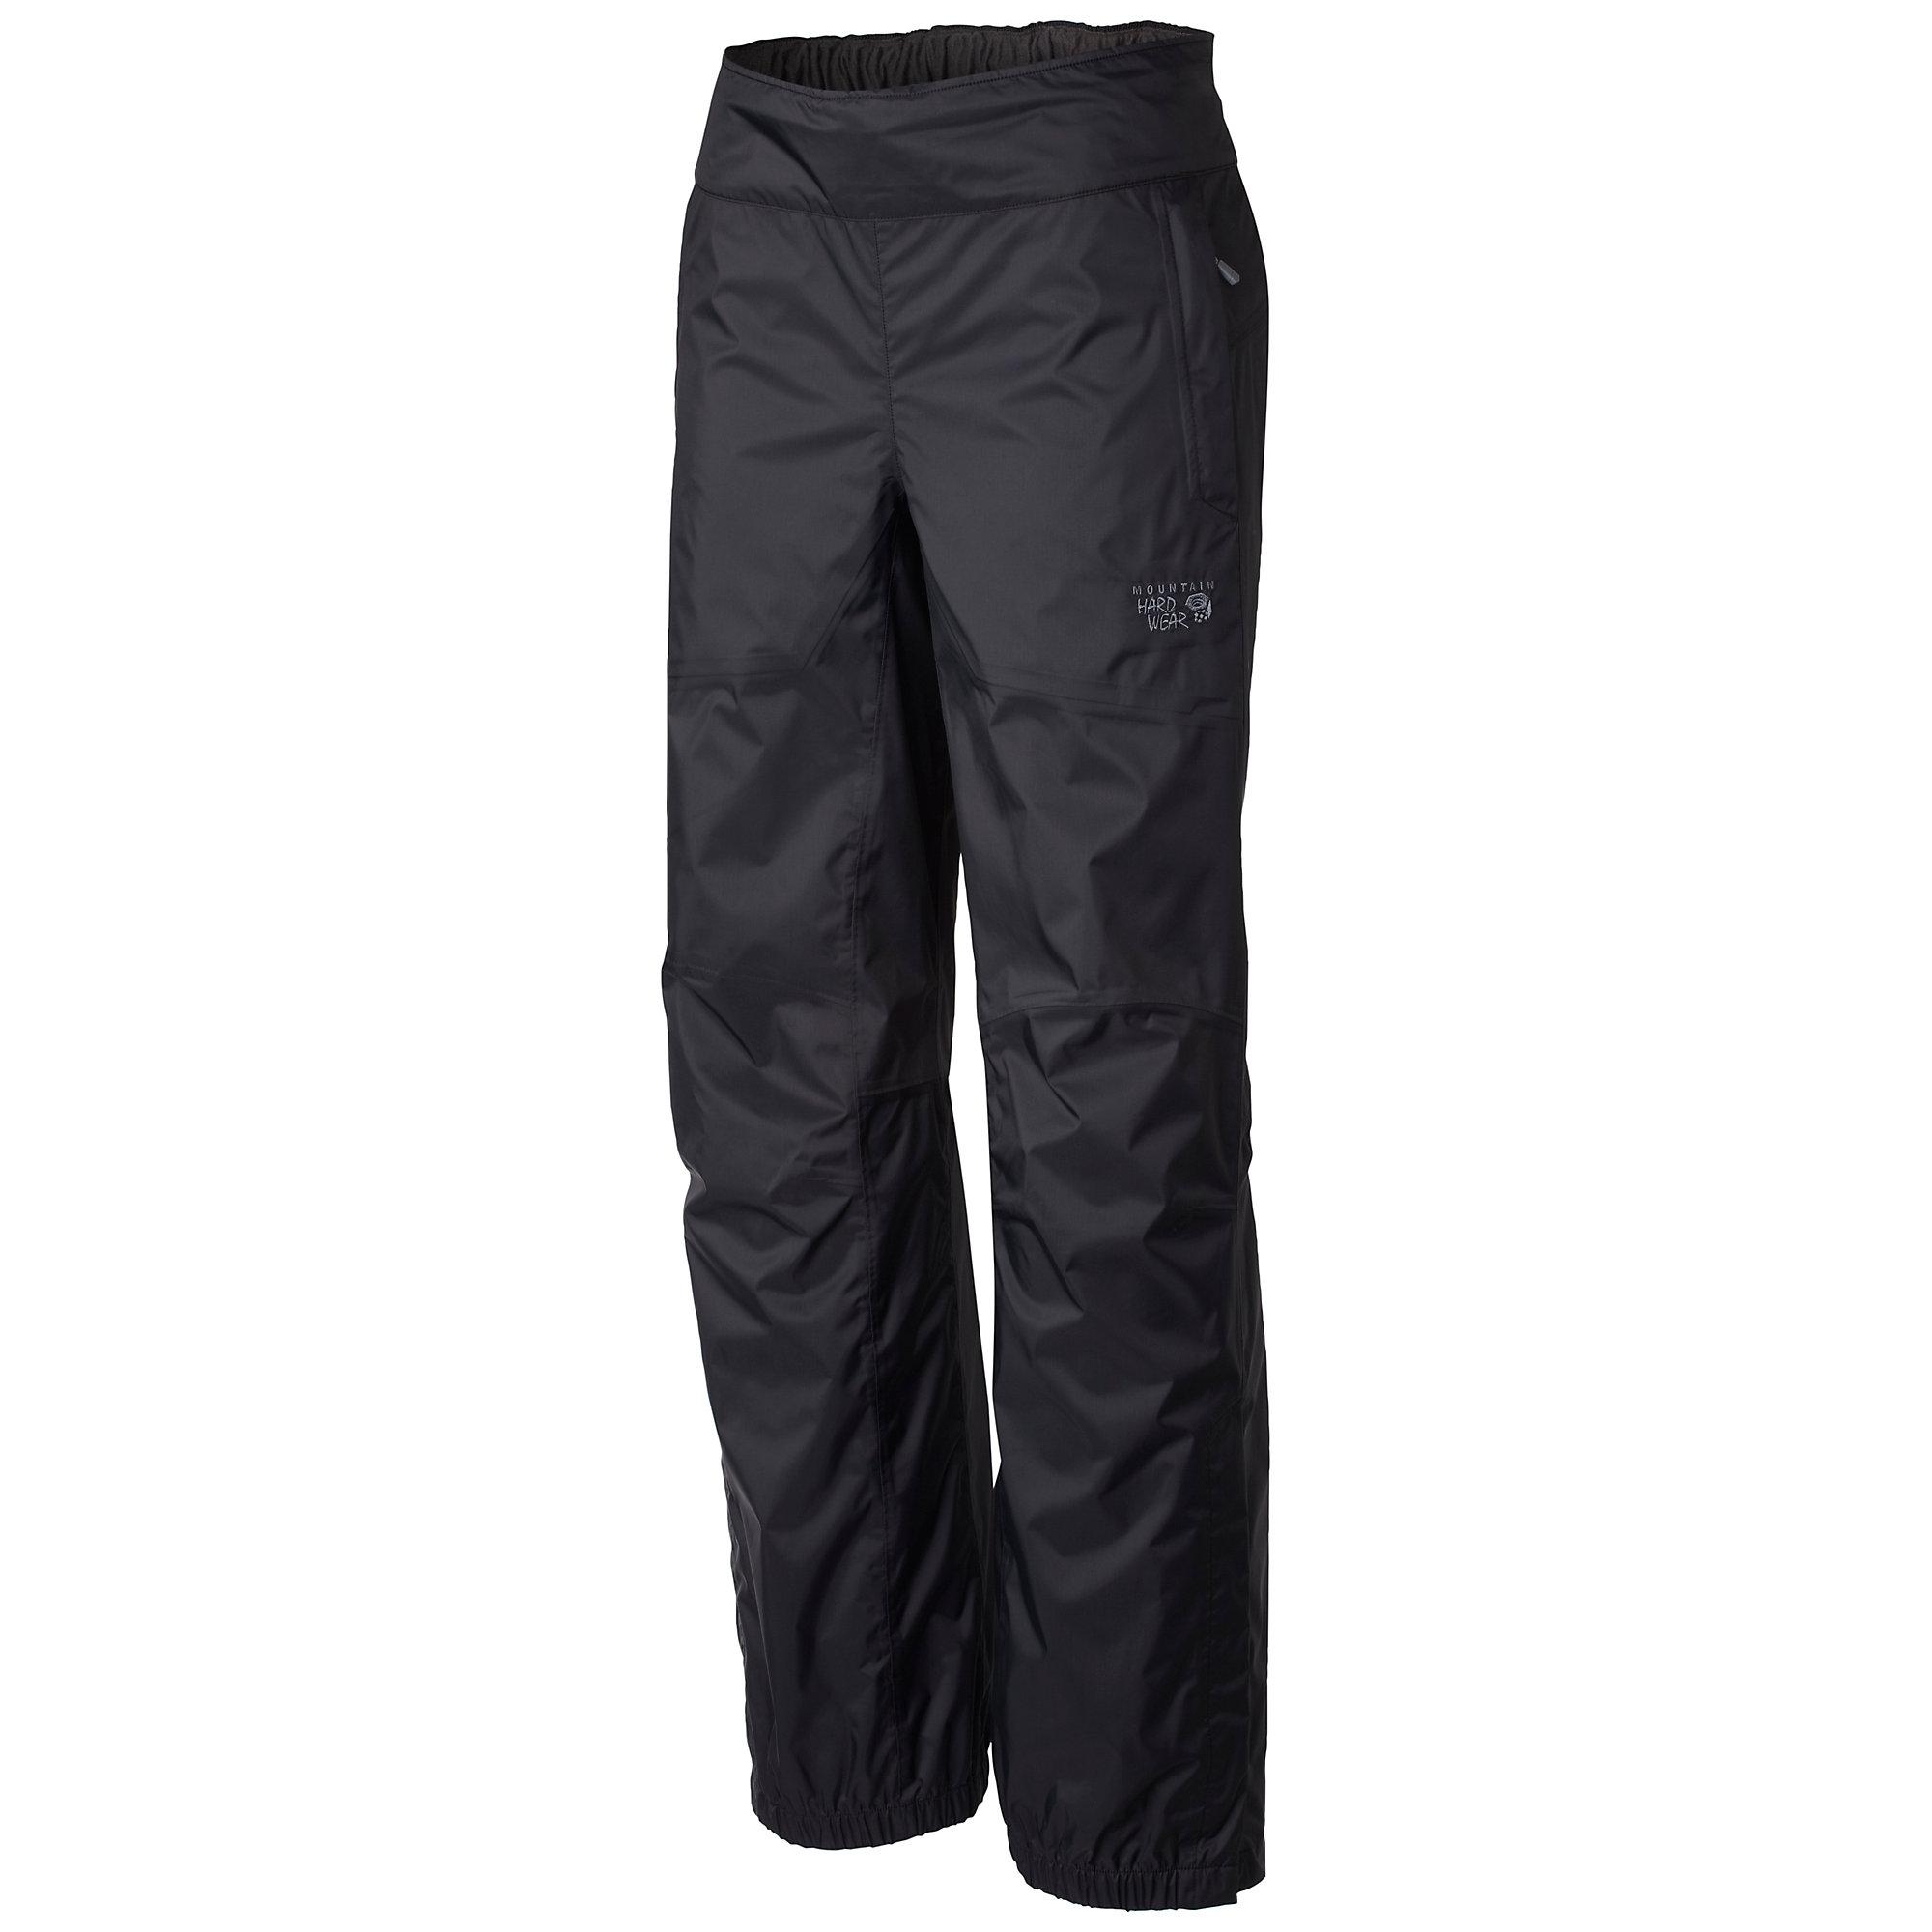 Mountain Hardwear Plasmic Ion Pant